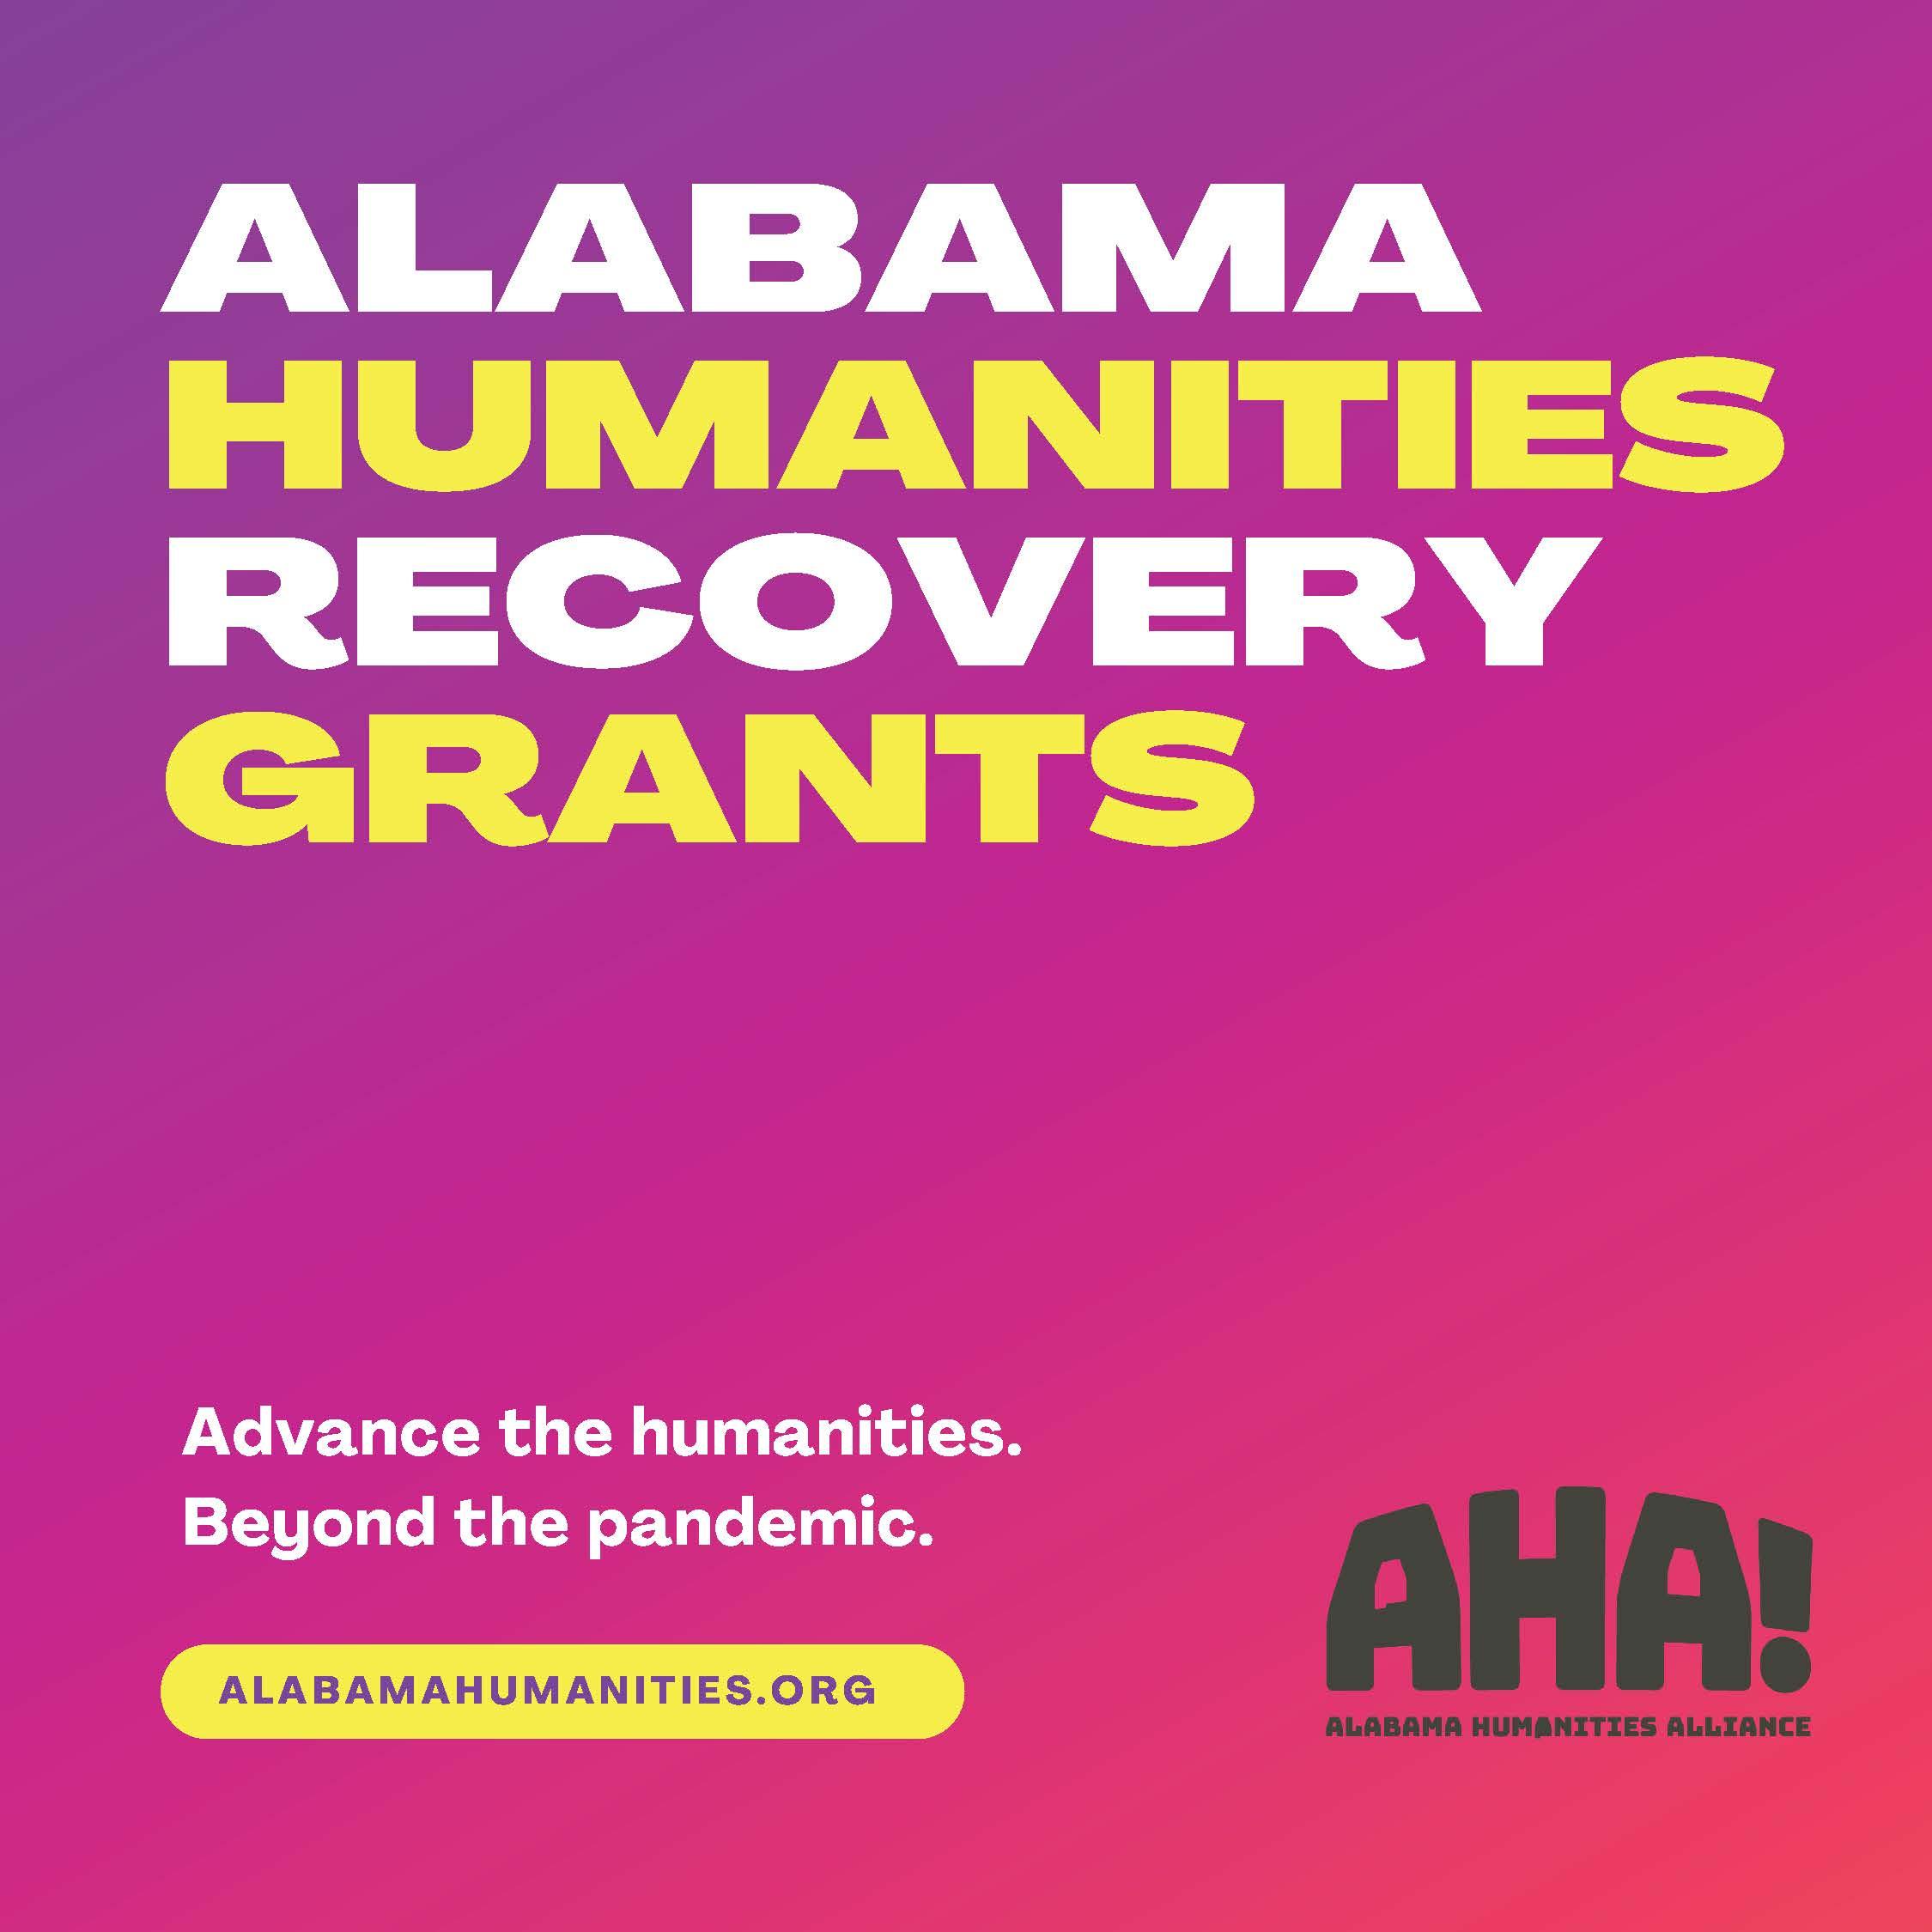 Alabama Humanities Recovery Grants